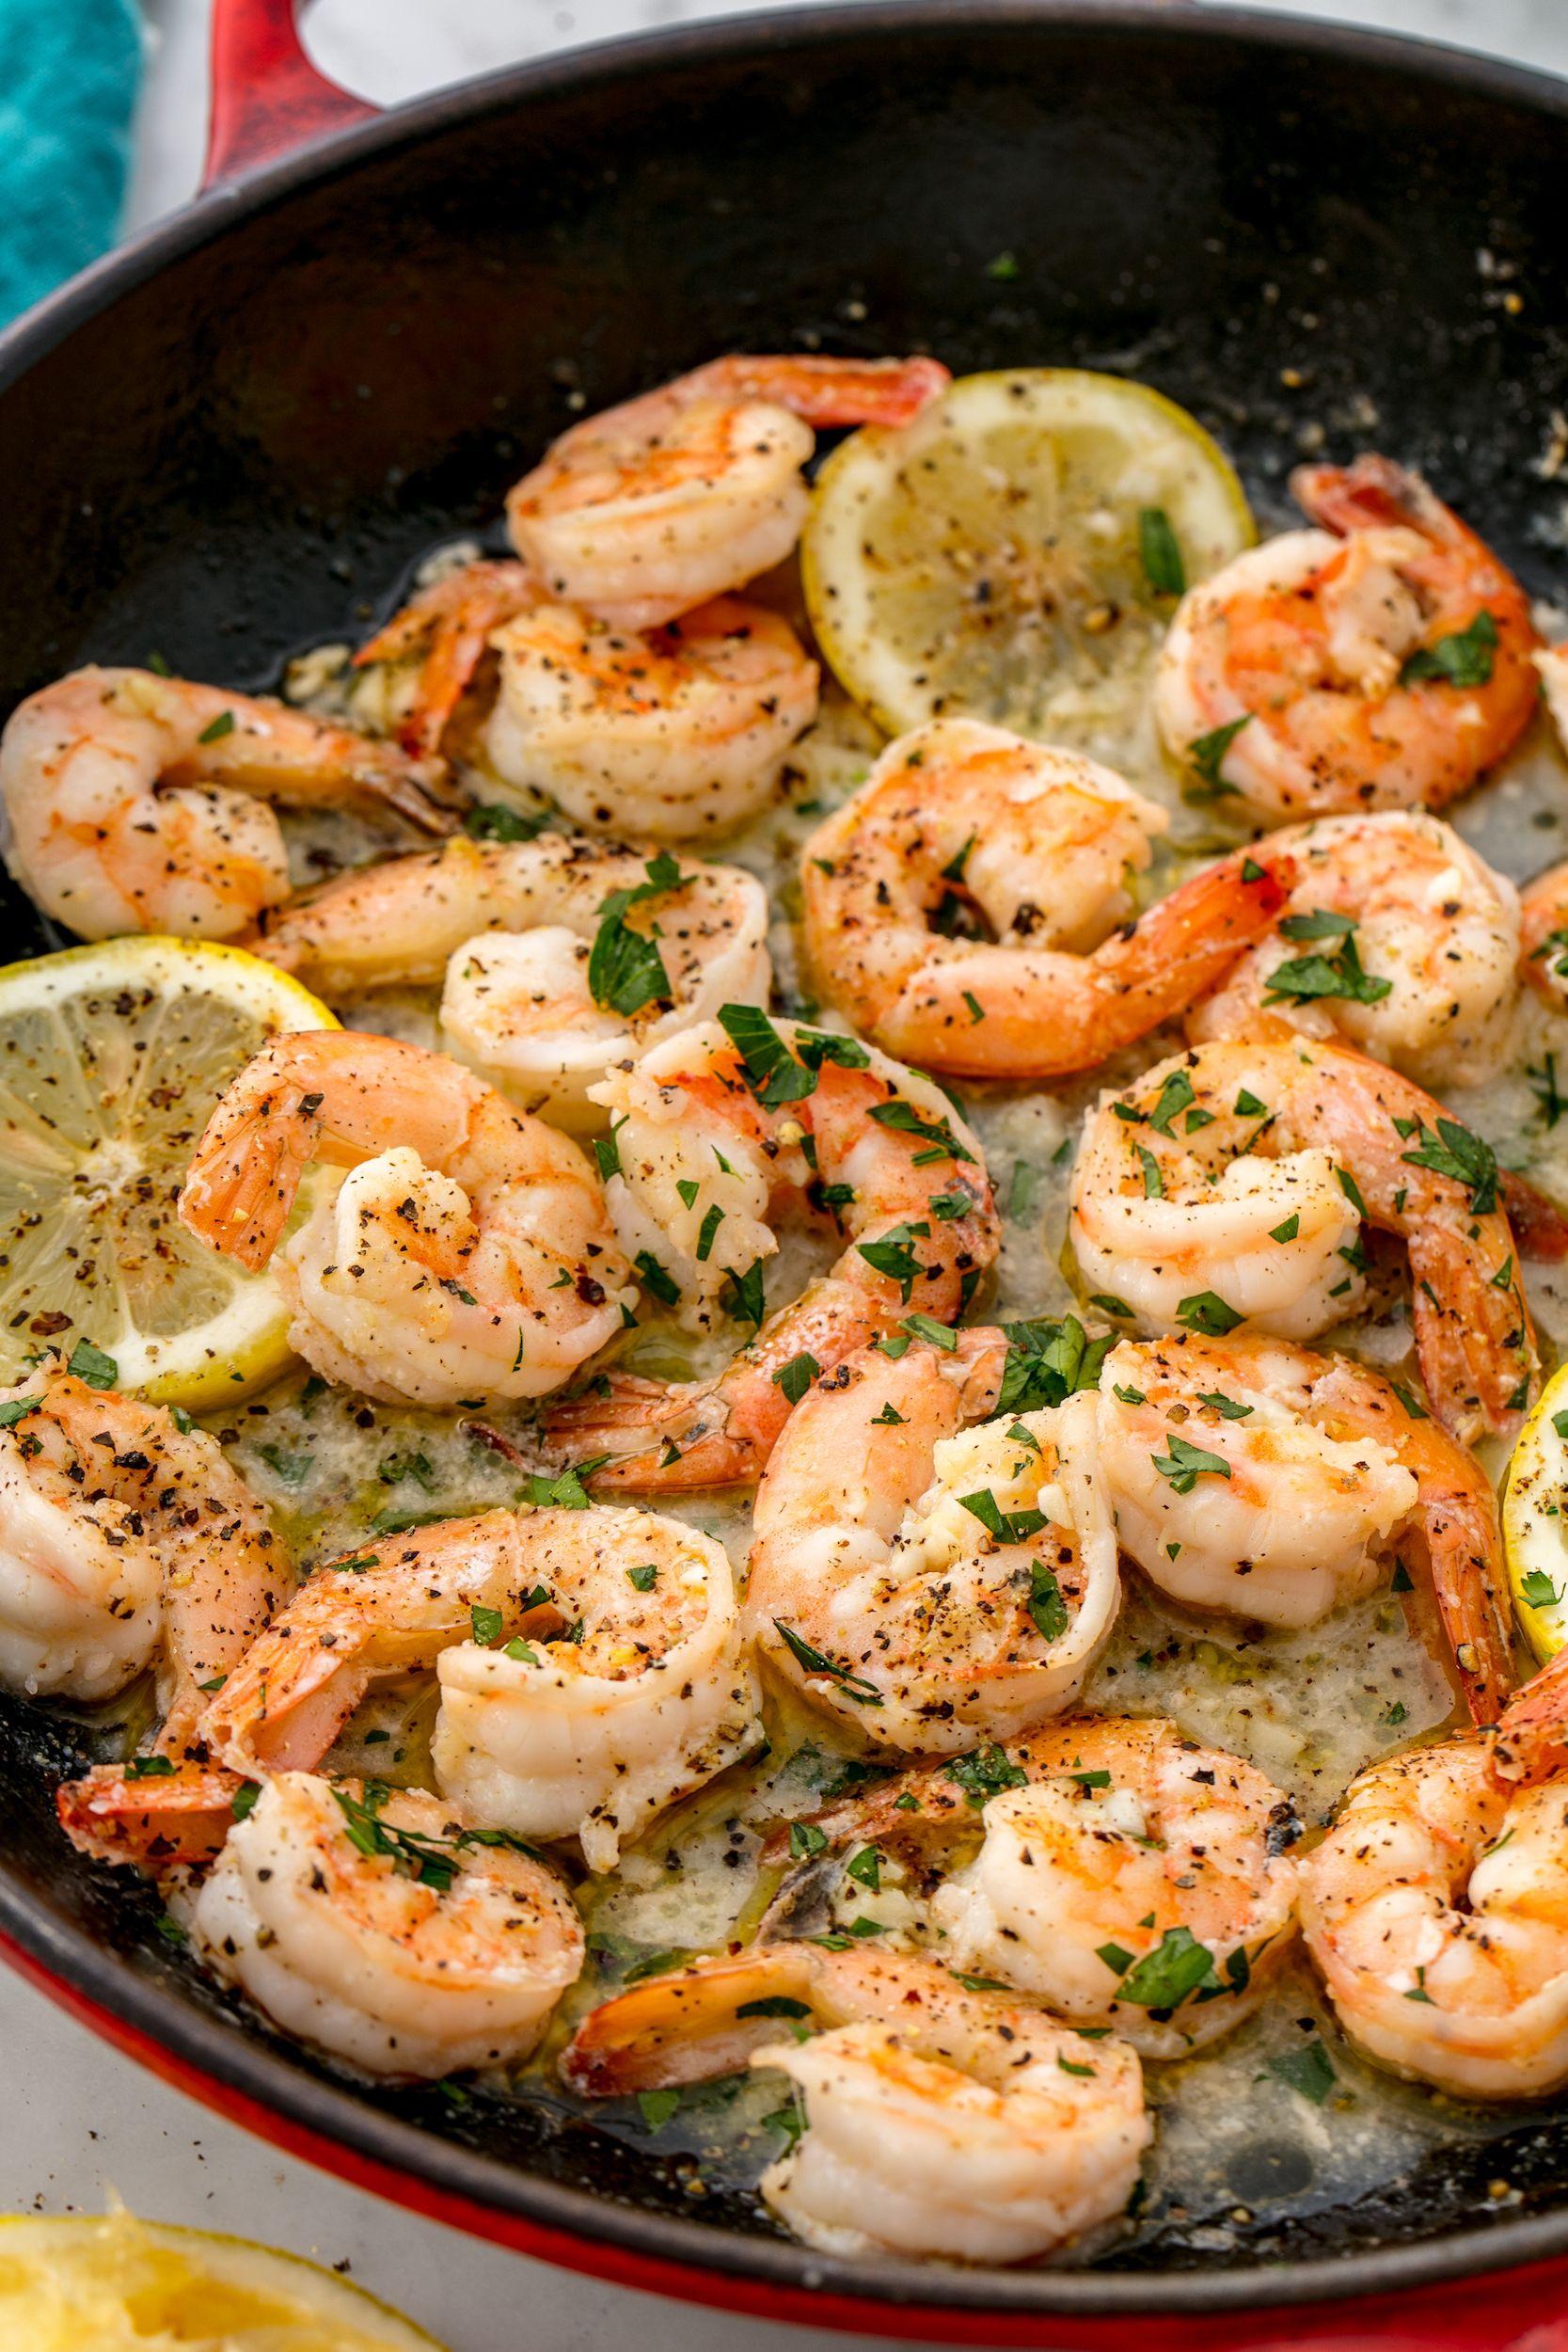 Seemly 1506010449 Lemon Garlic Shrimp Delish 1 How To Saute Shrimp Scallops Spinach How To Saute Shrimp nice food How To Saute Shrimp